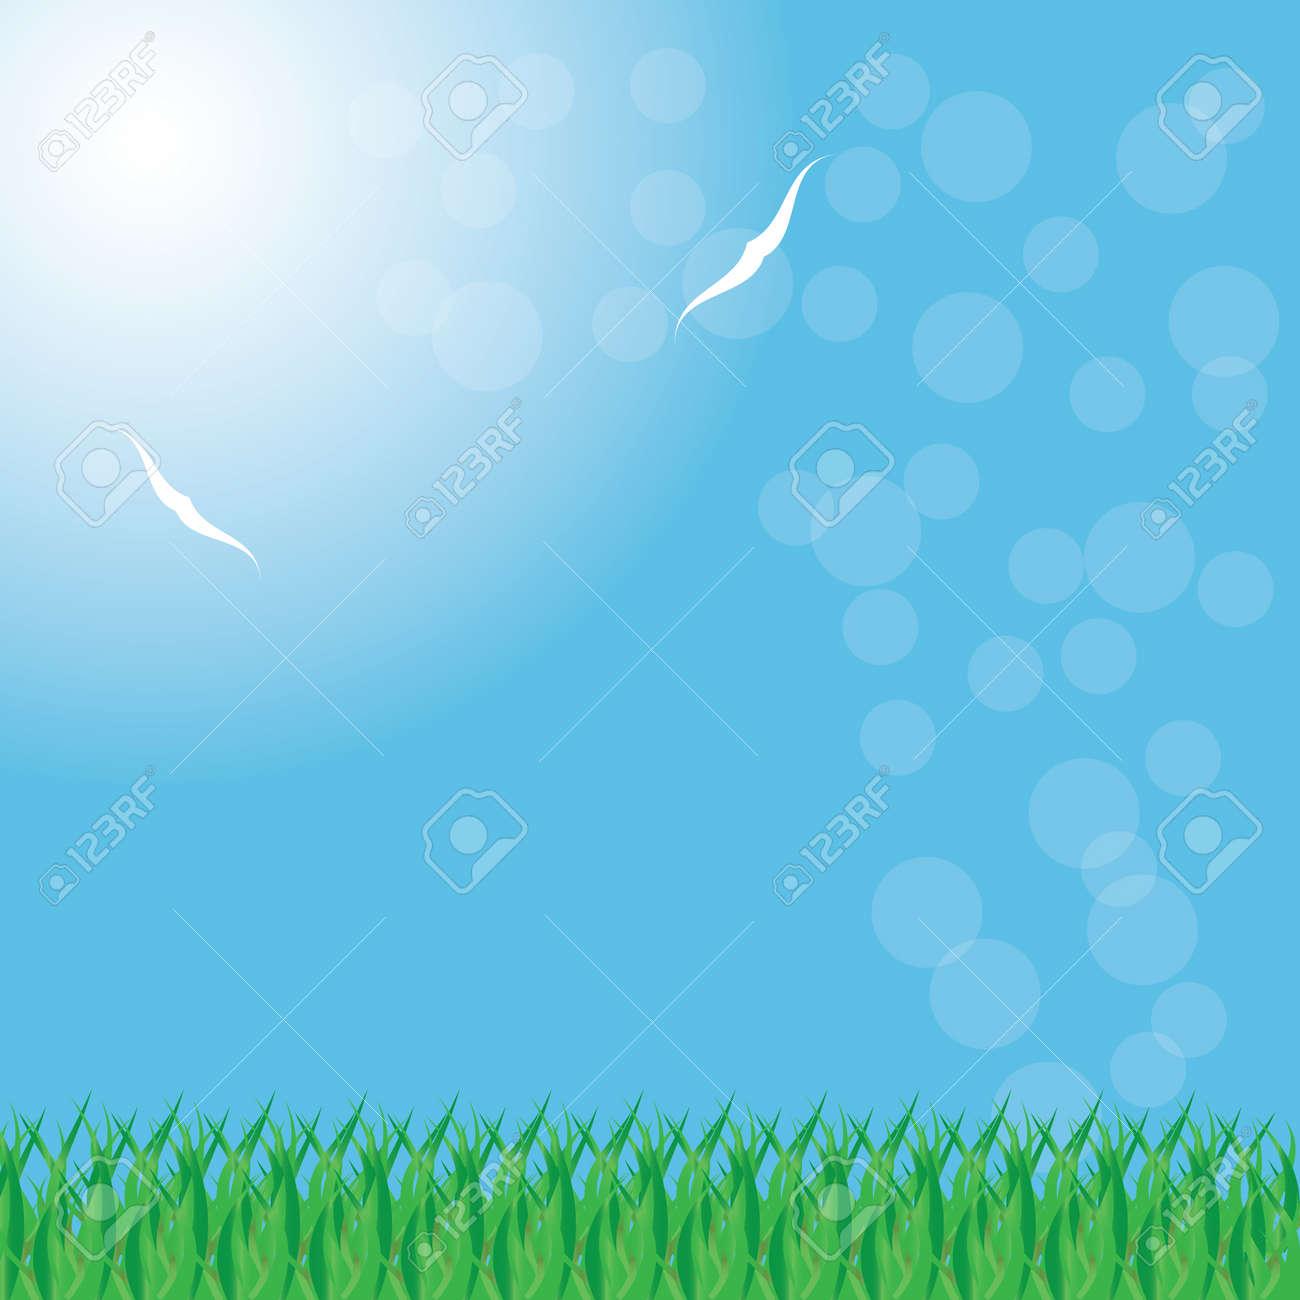 Summer background whit grass vector Stock Vector - 19290443